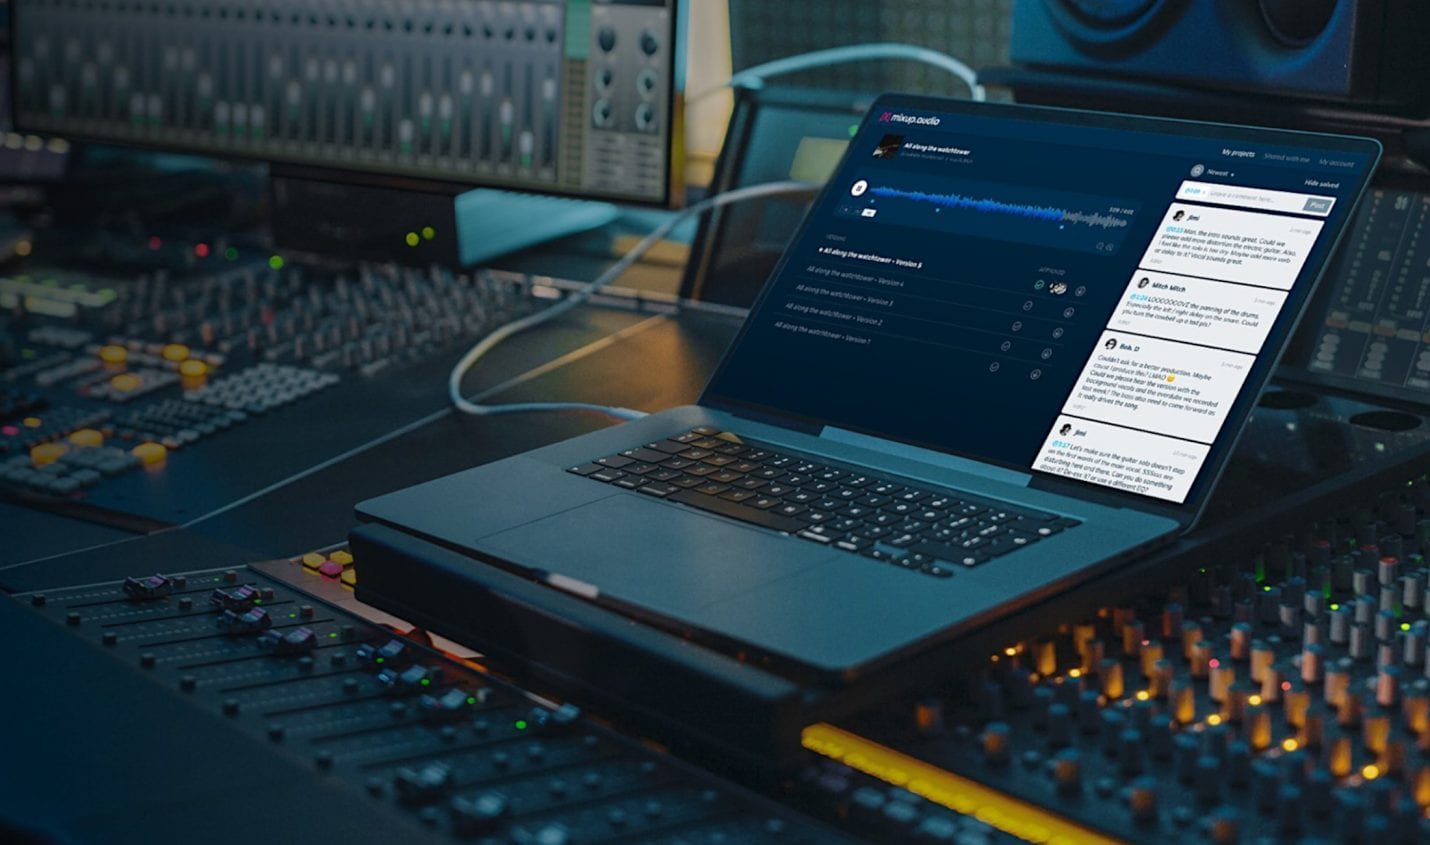 pureMix Mixup: Feedback ganz einfach per Cloud einholen